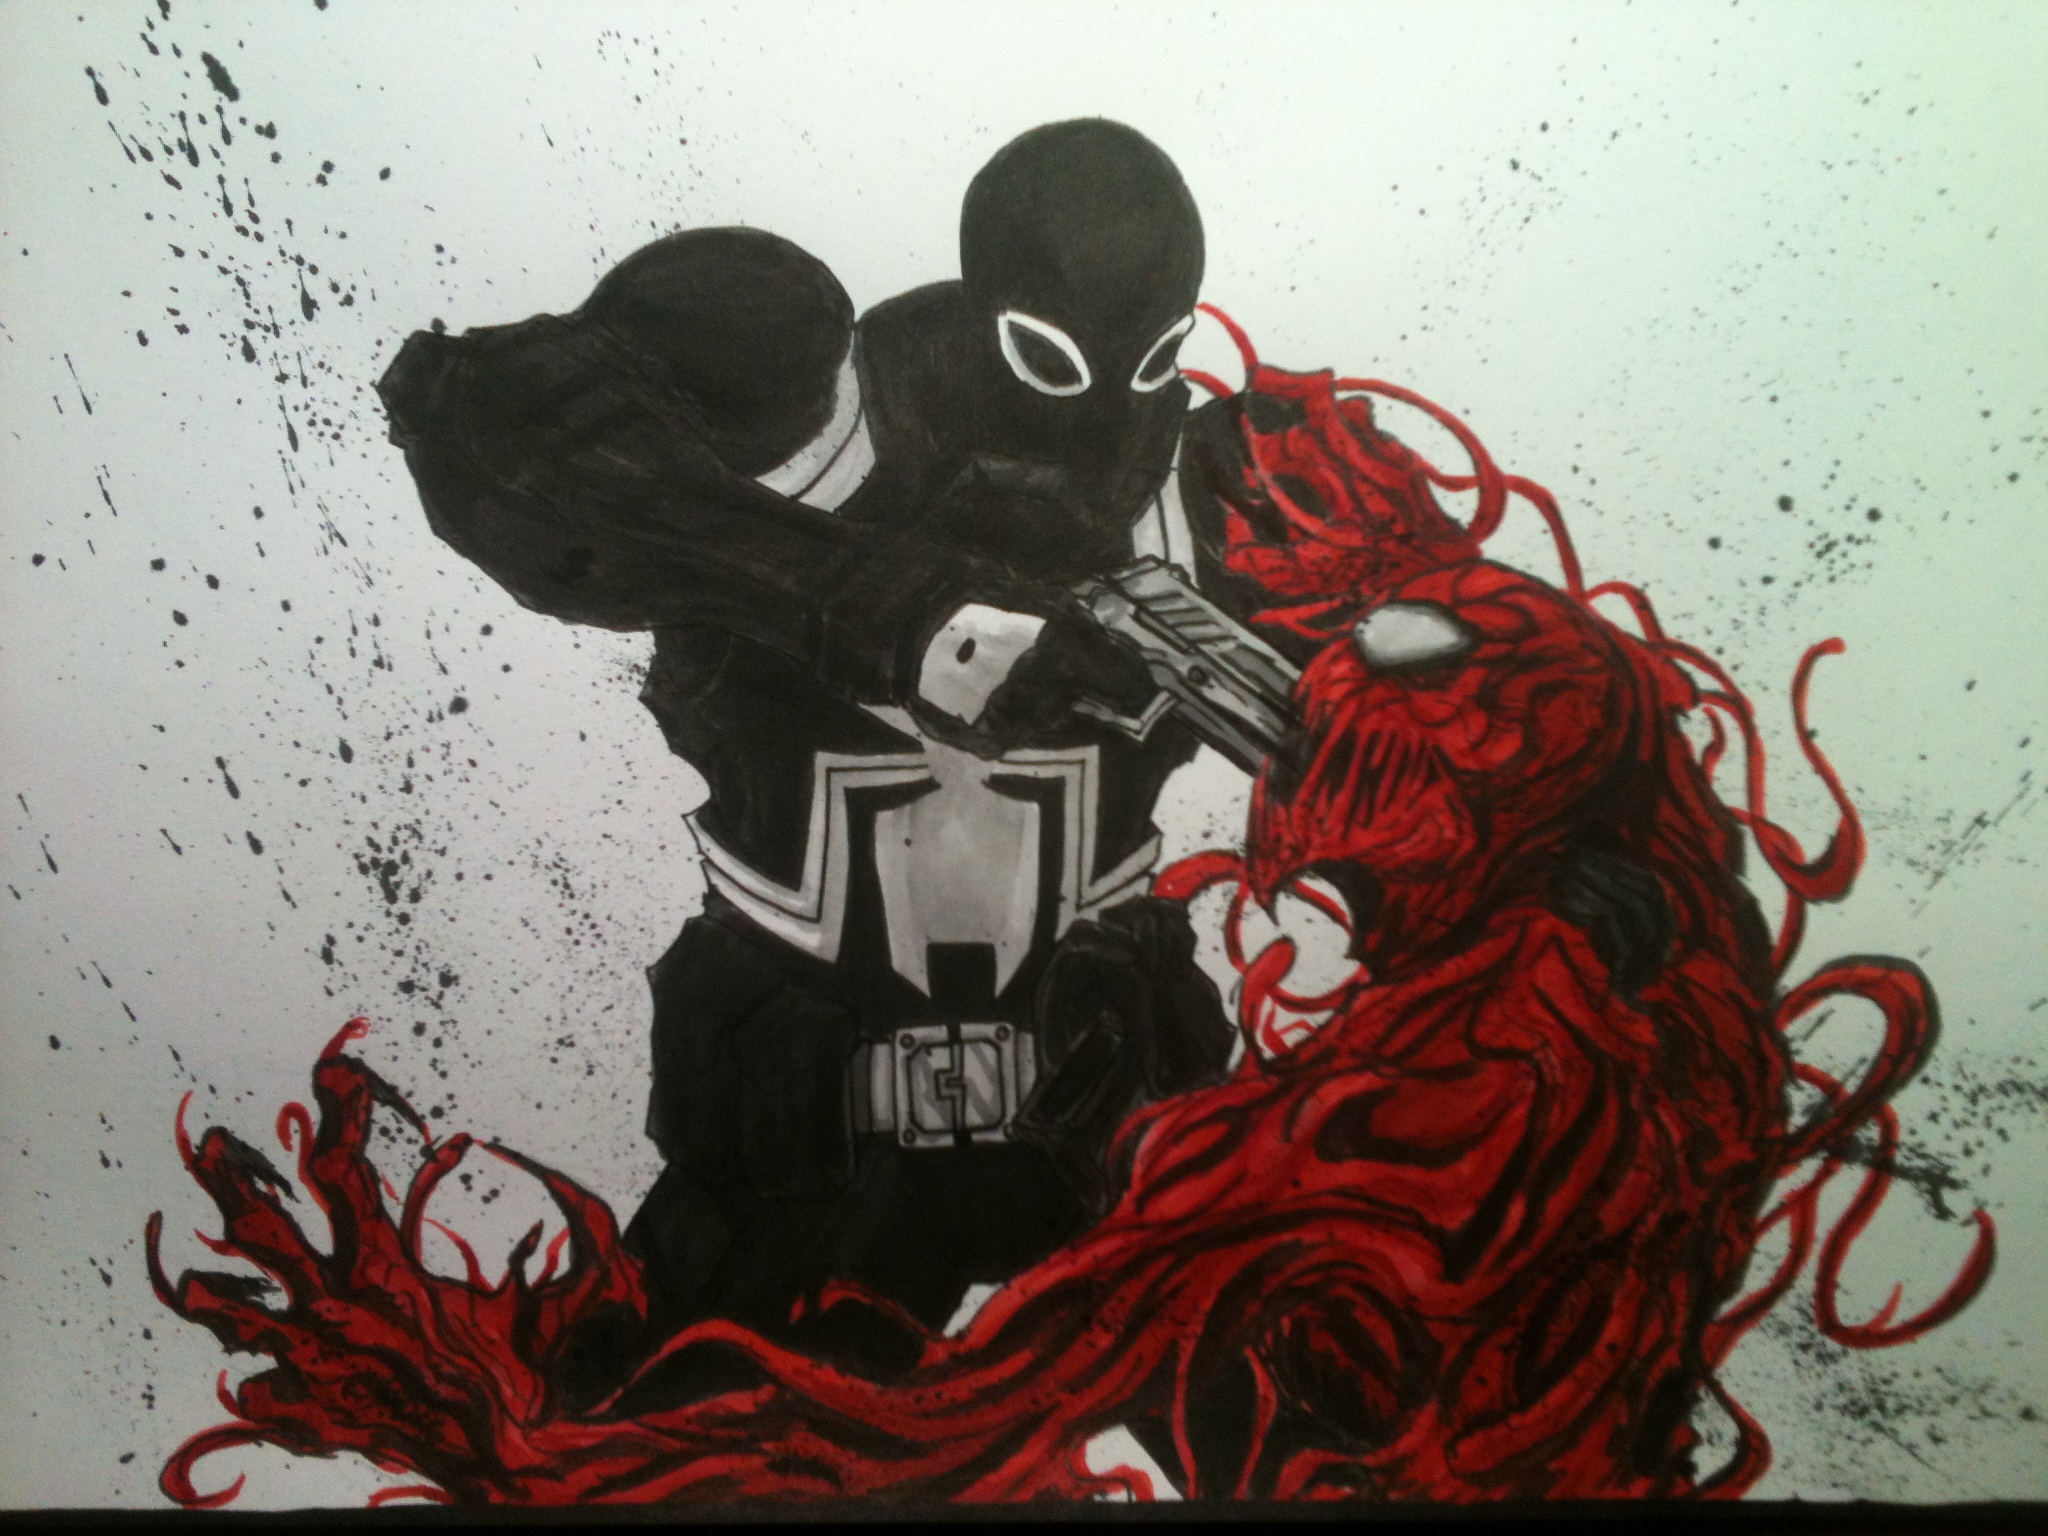 Agent Venom vs Carnage by LeeChandler 2048x1536